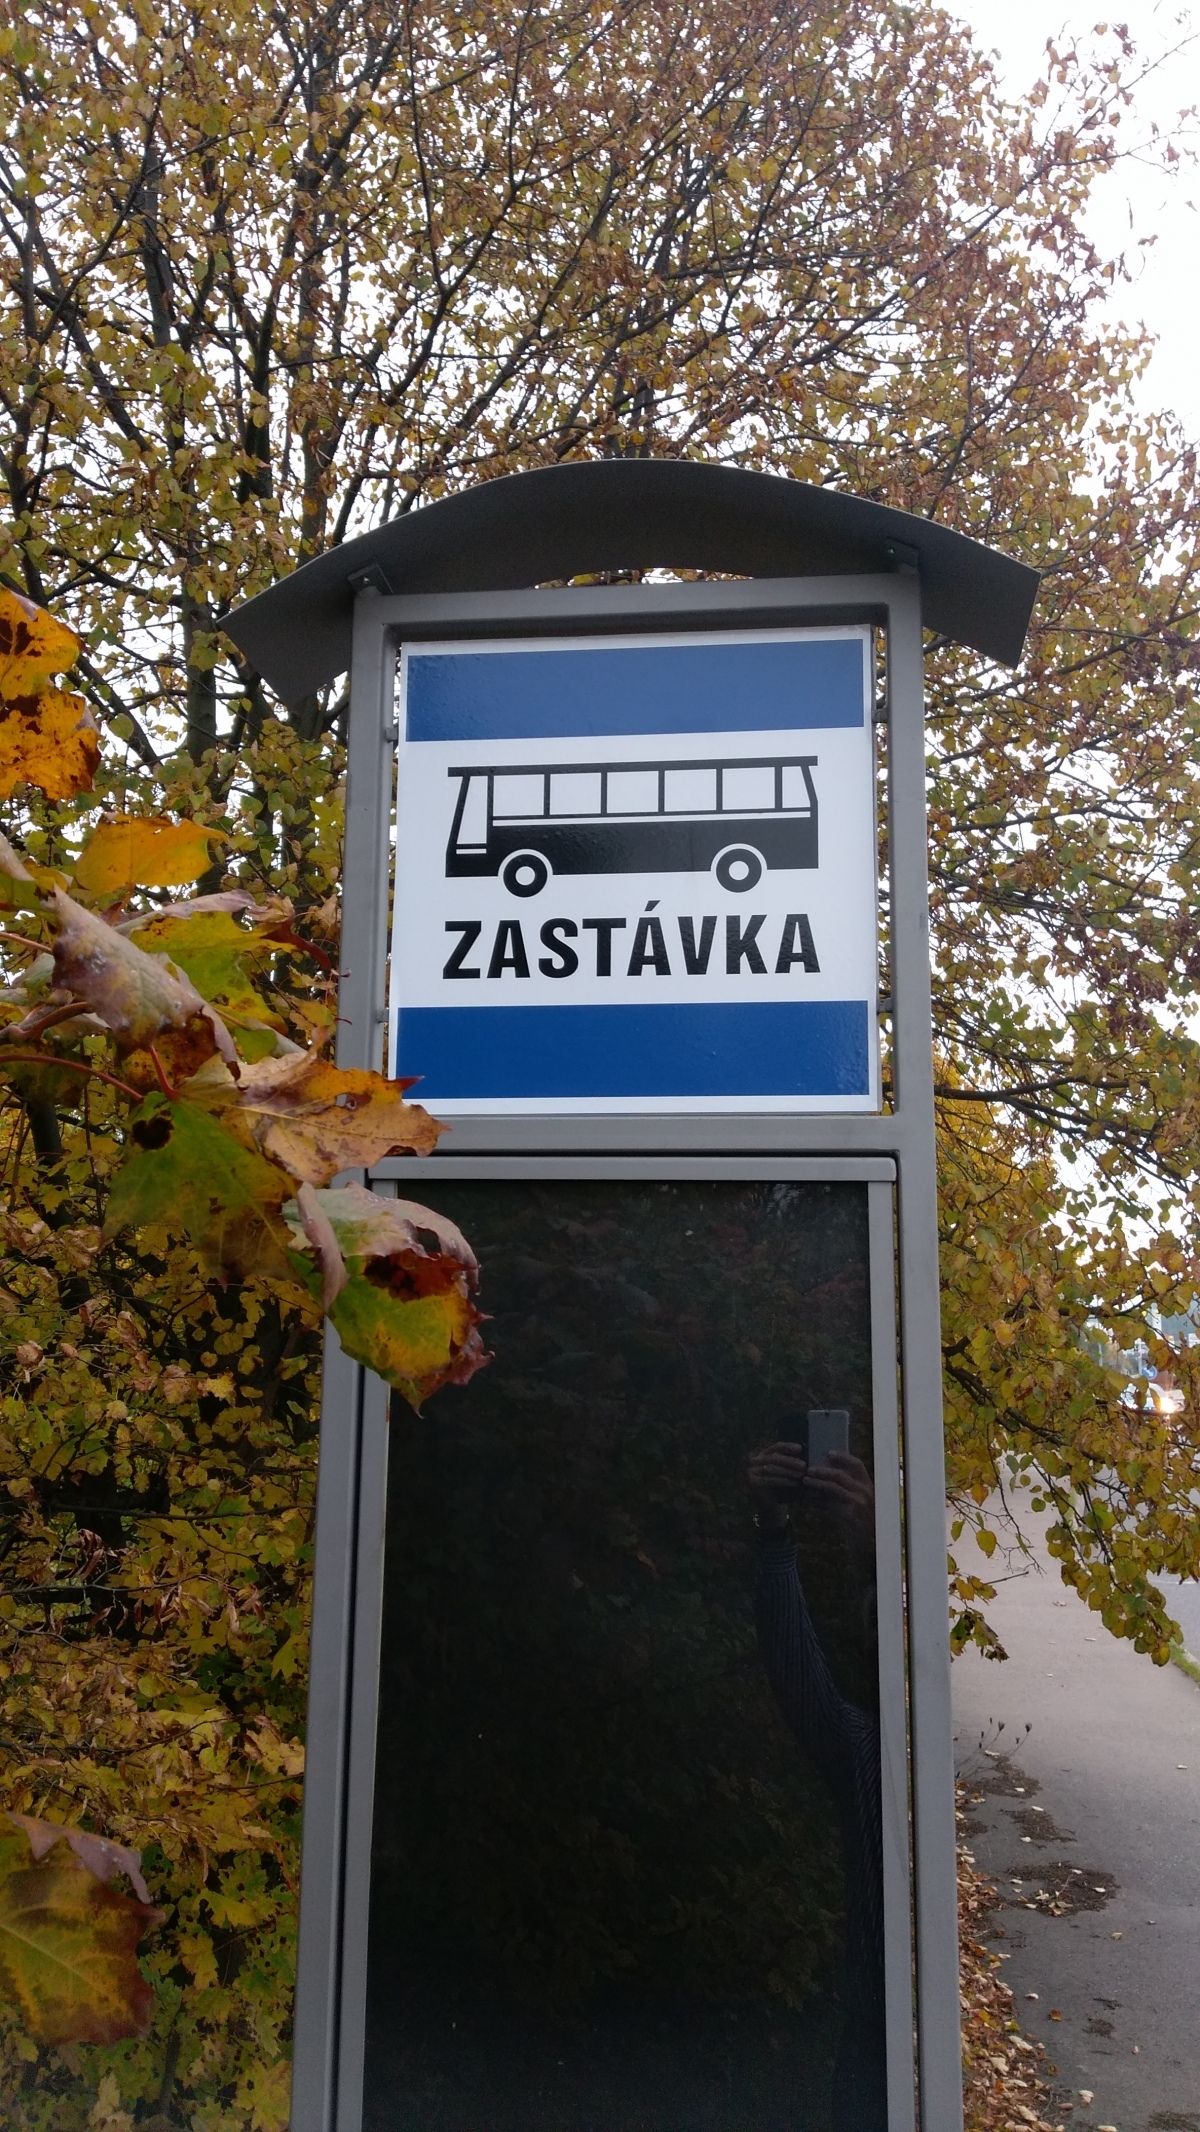 Označení autobusových zastávek